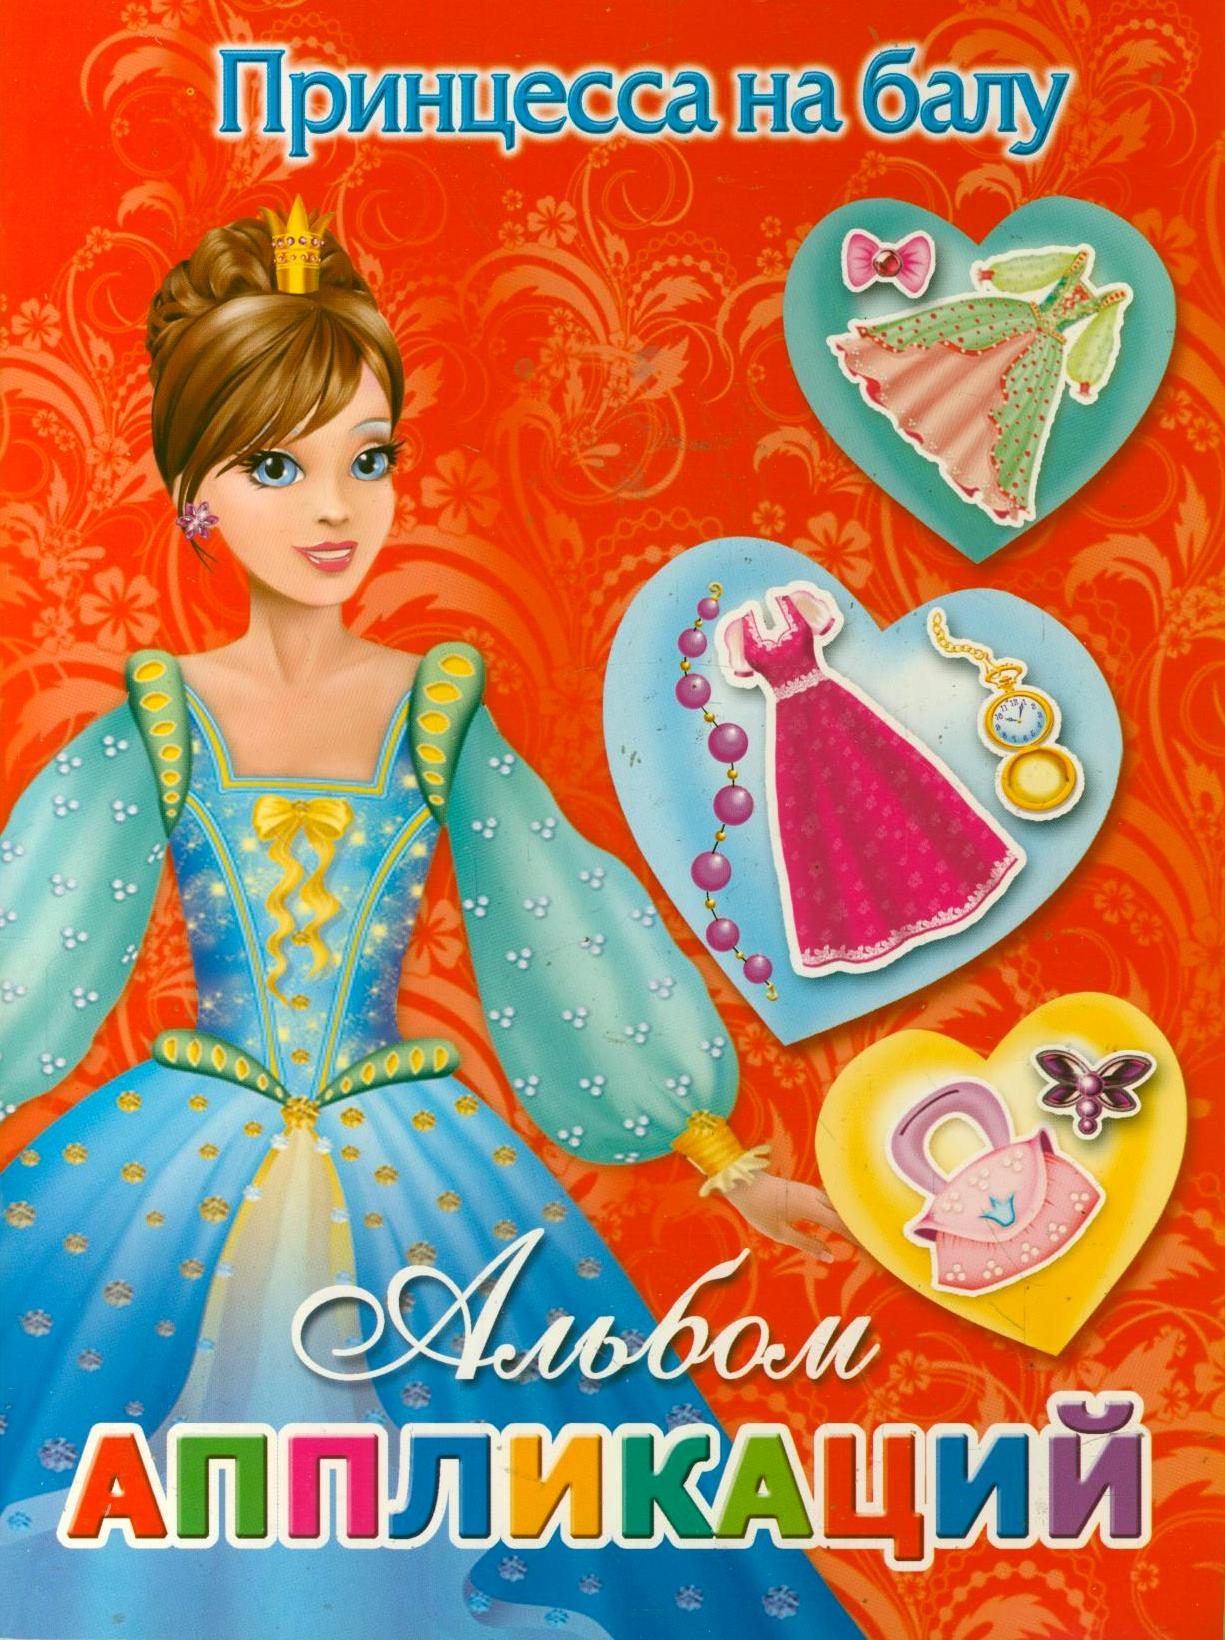 Принцесса на балу: Альбом аппликаций